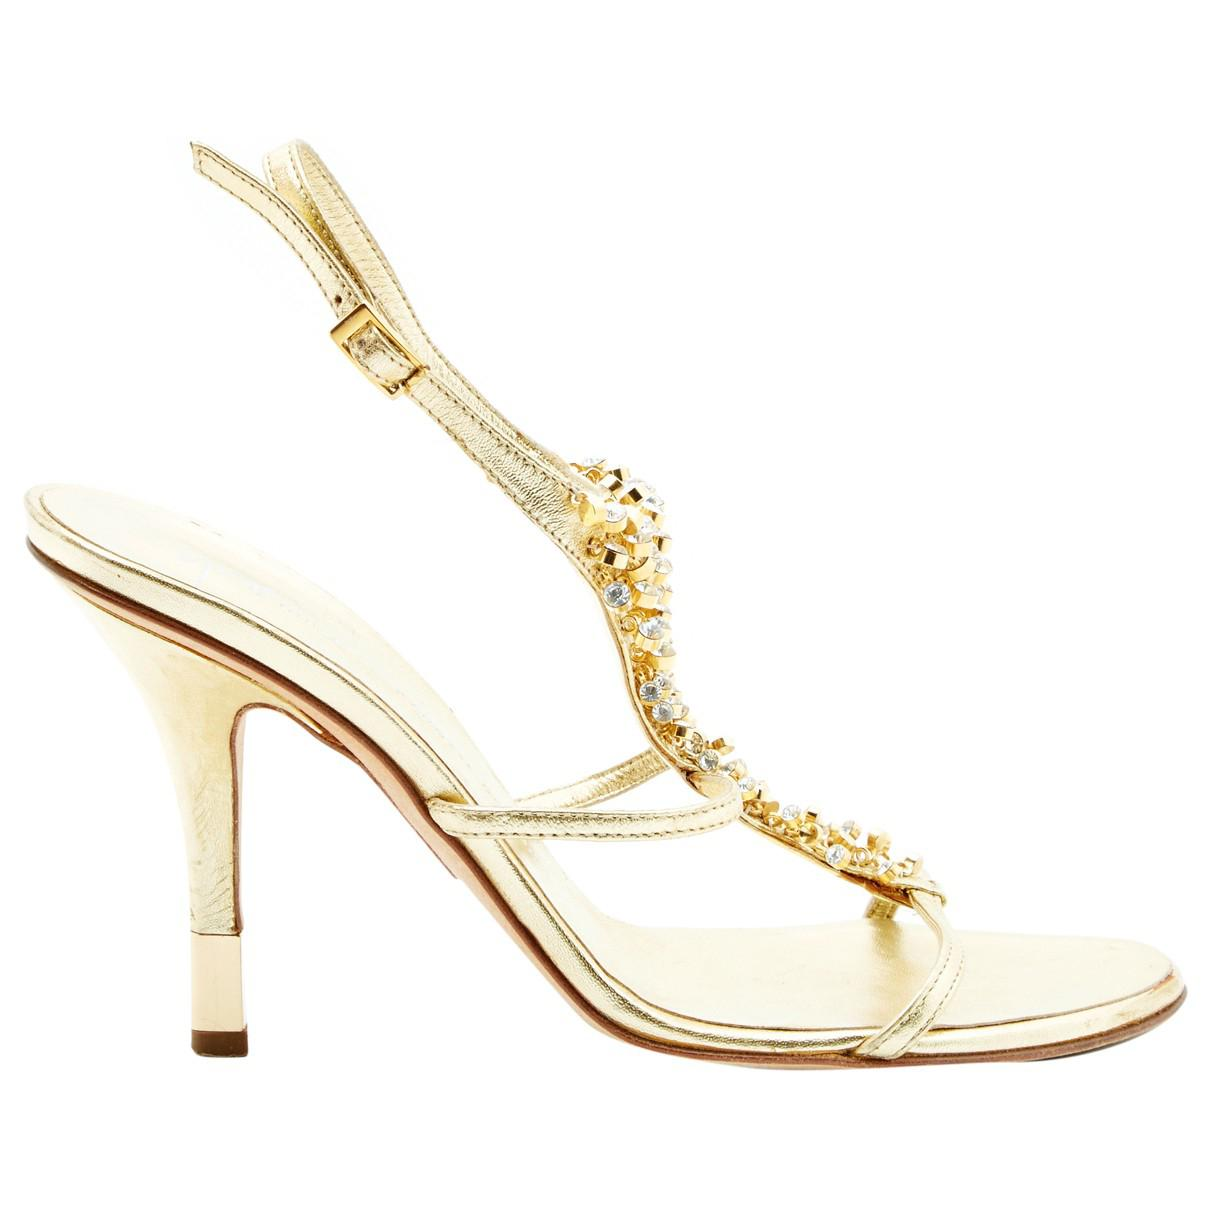 e87d4a5394 Lyst - Giuseppe Zanotti Leather Sandals in Metallic